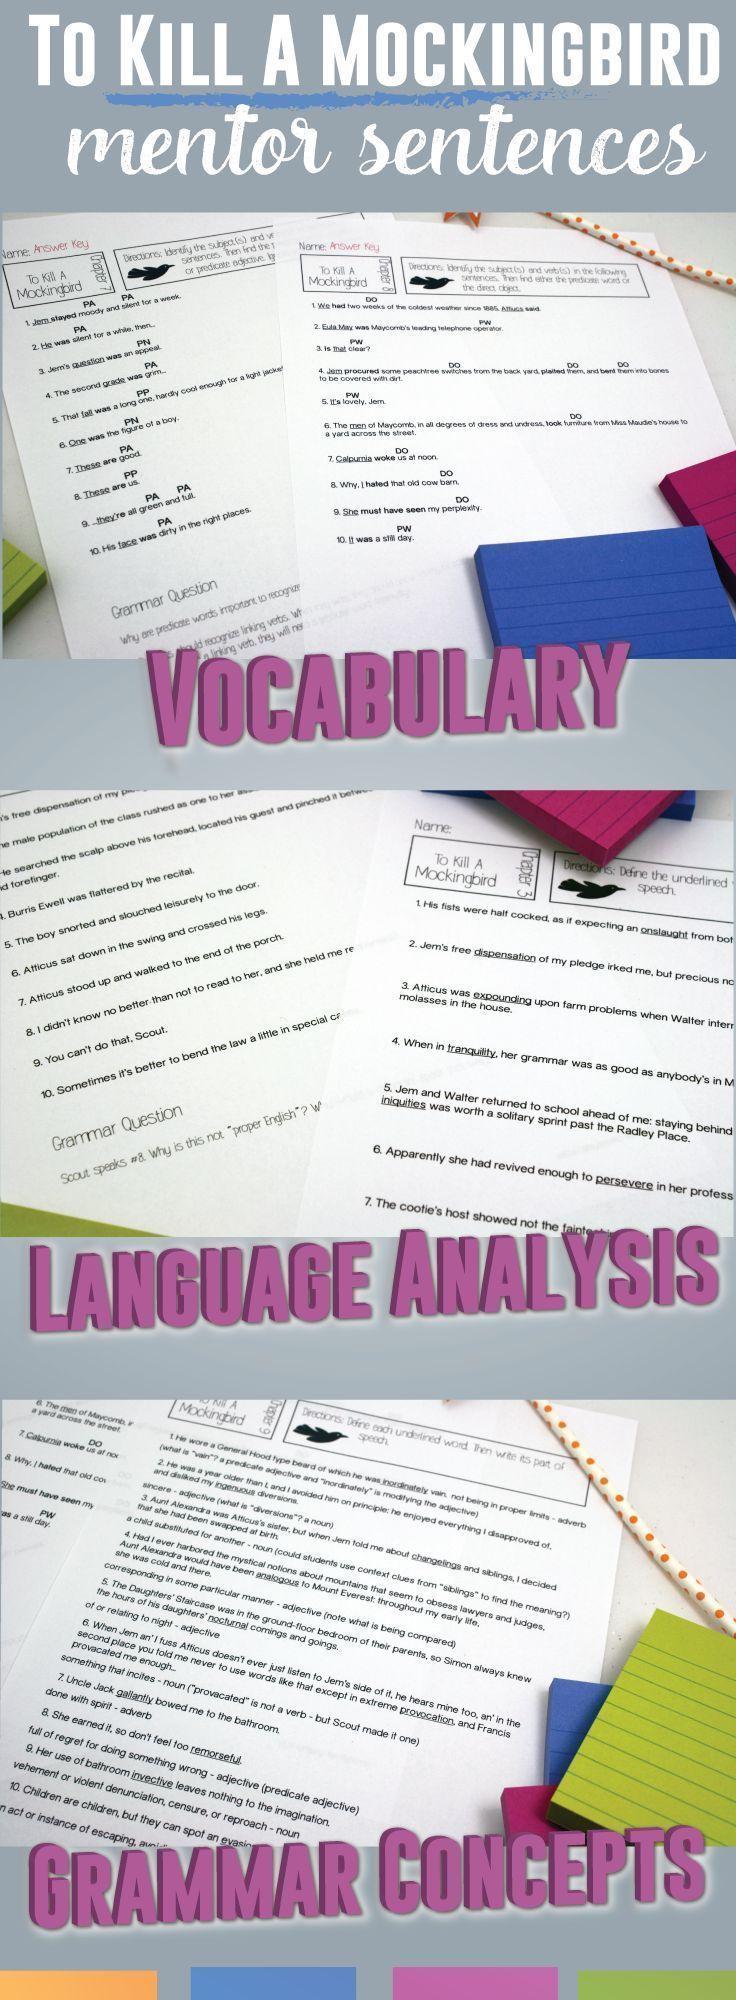 worksheet To Kill A Mockingbird Vocabulary Worksheet mentor sentences for to kill a mockingbird analyze the language discuss implications of